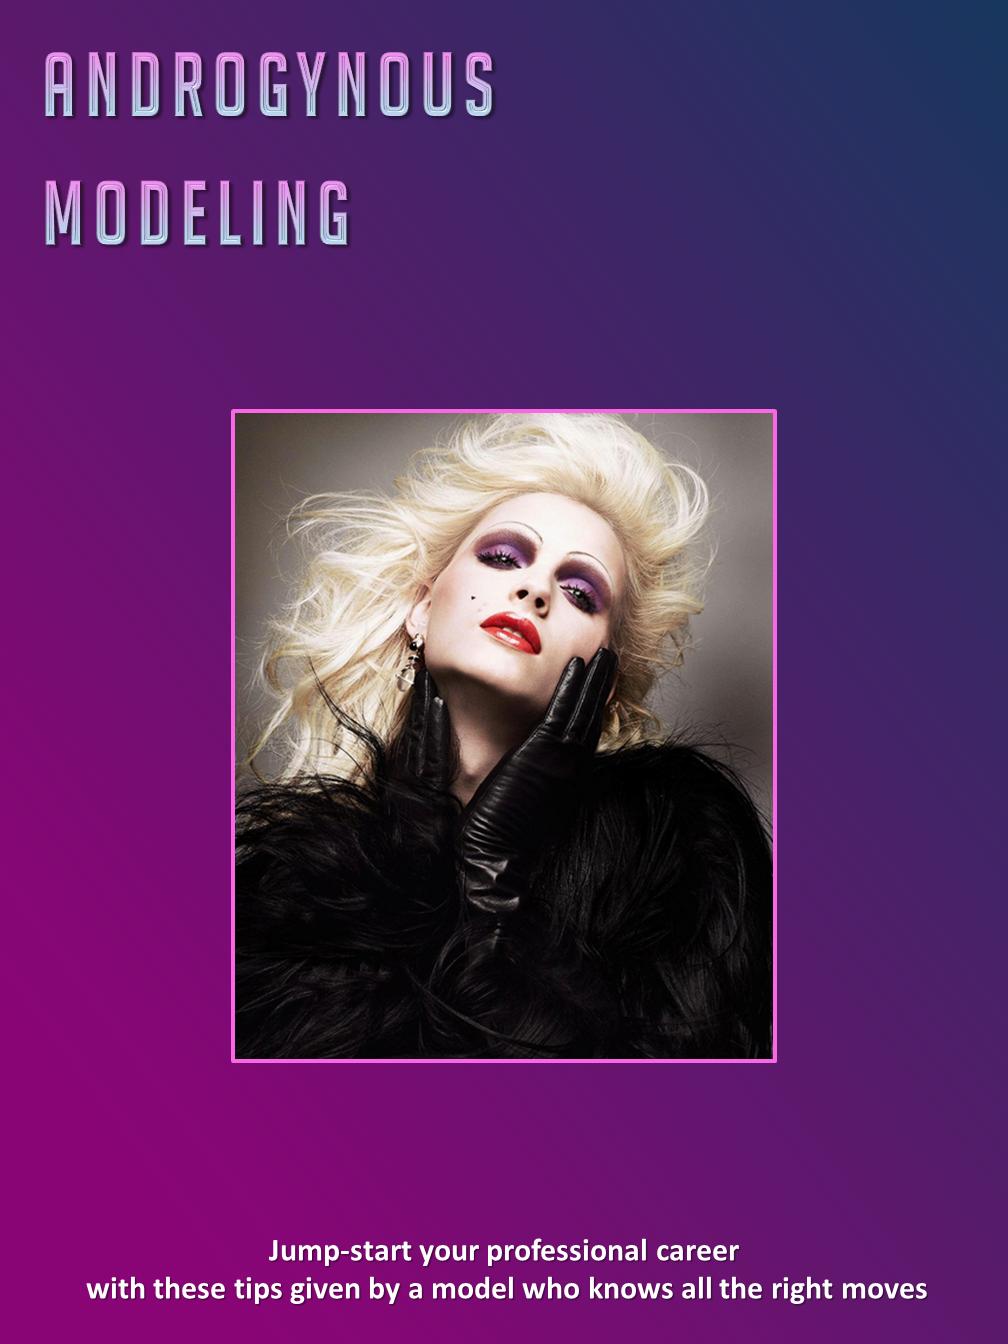 Andorogynous Models